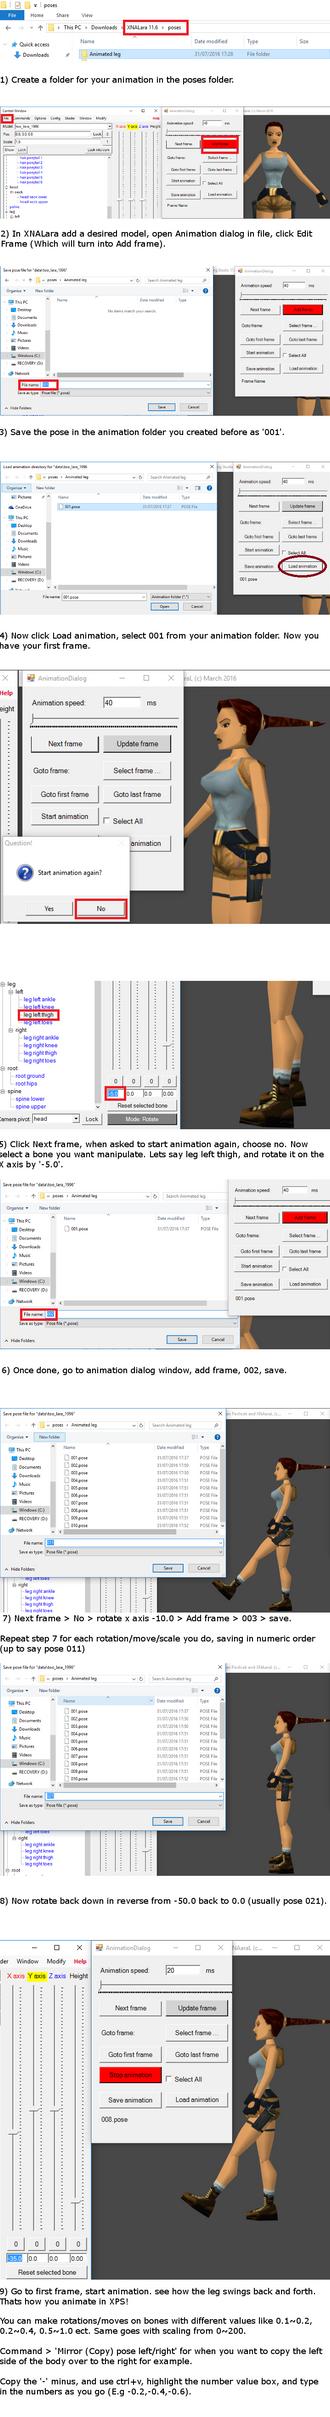 Xnalara xps animation tutorial by reebledeebles on deviantart xnalara xps animation tutorial by reebledeebles ccuart Gallery